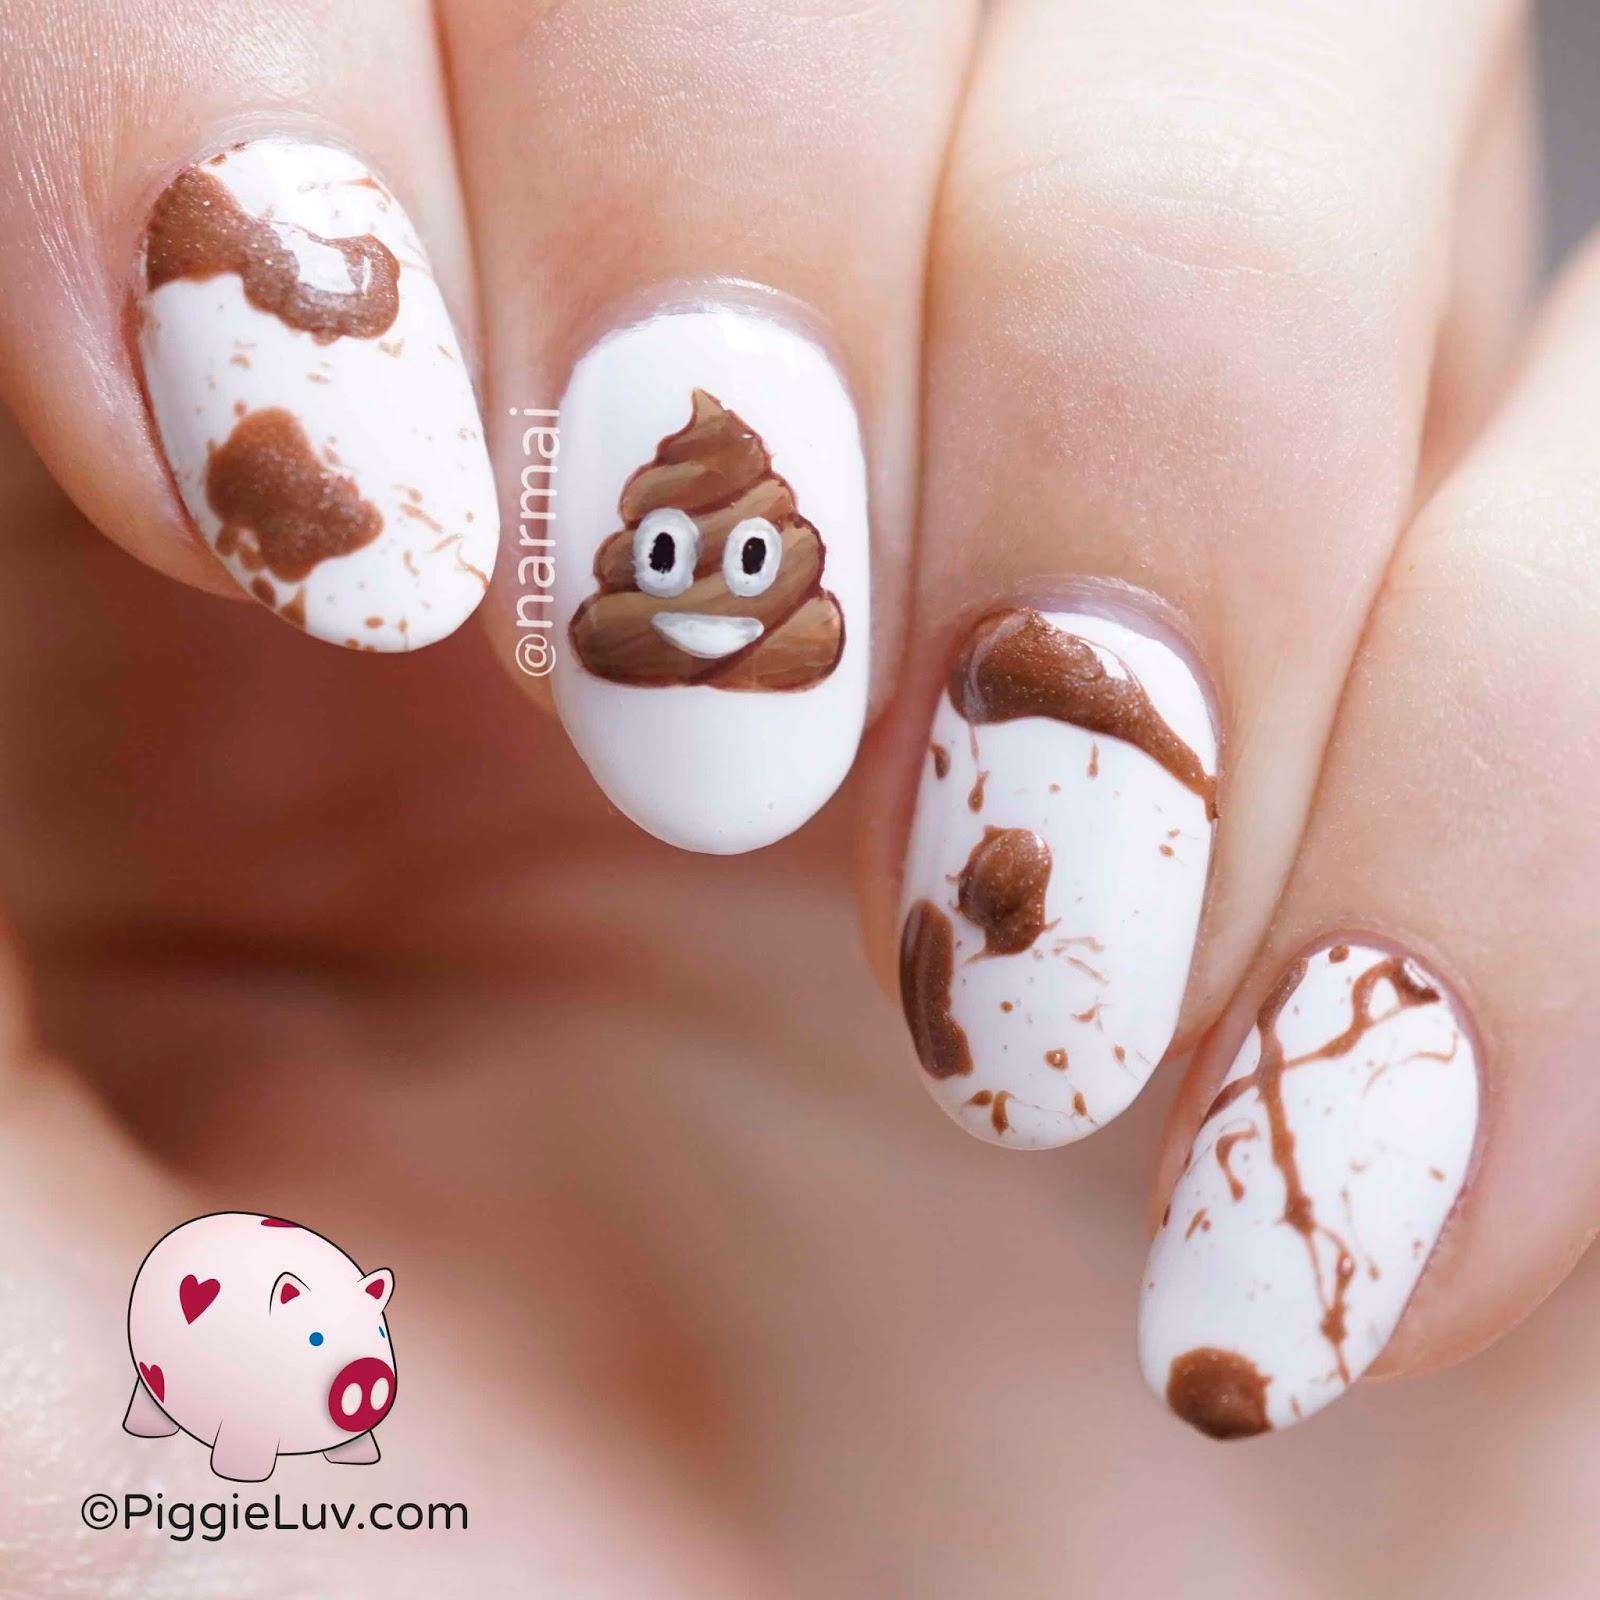 Piggieluv Poop Emoji Nail Art